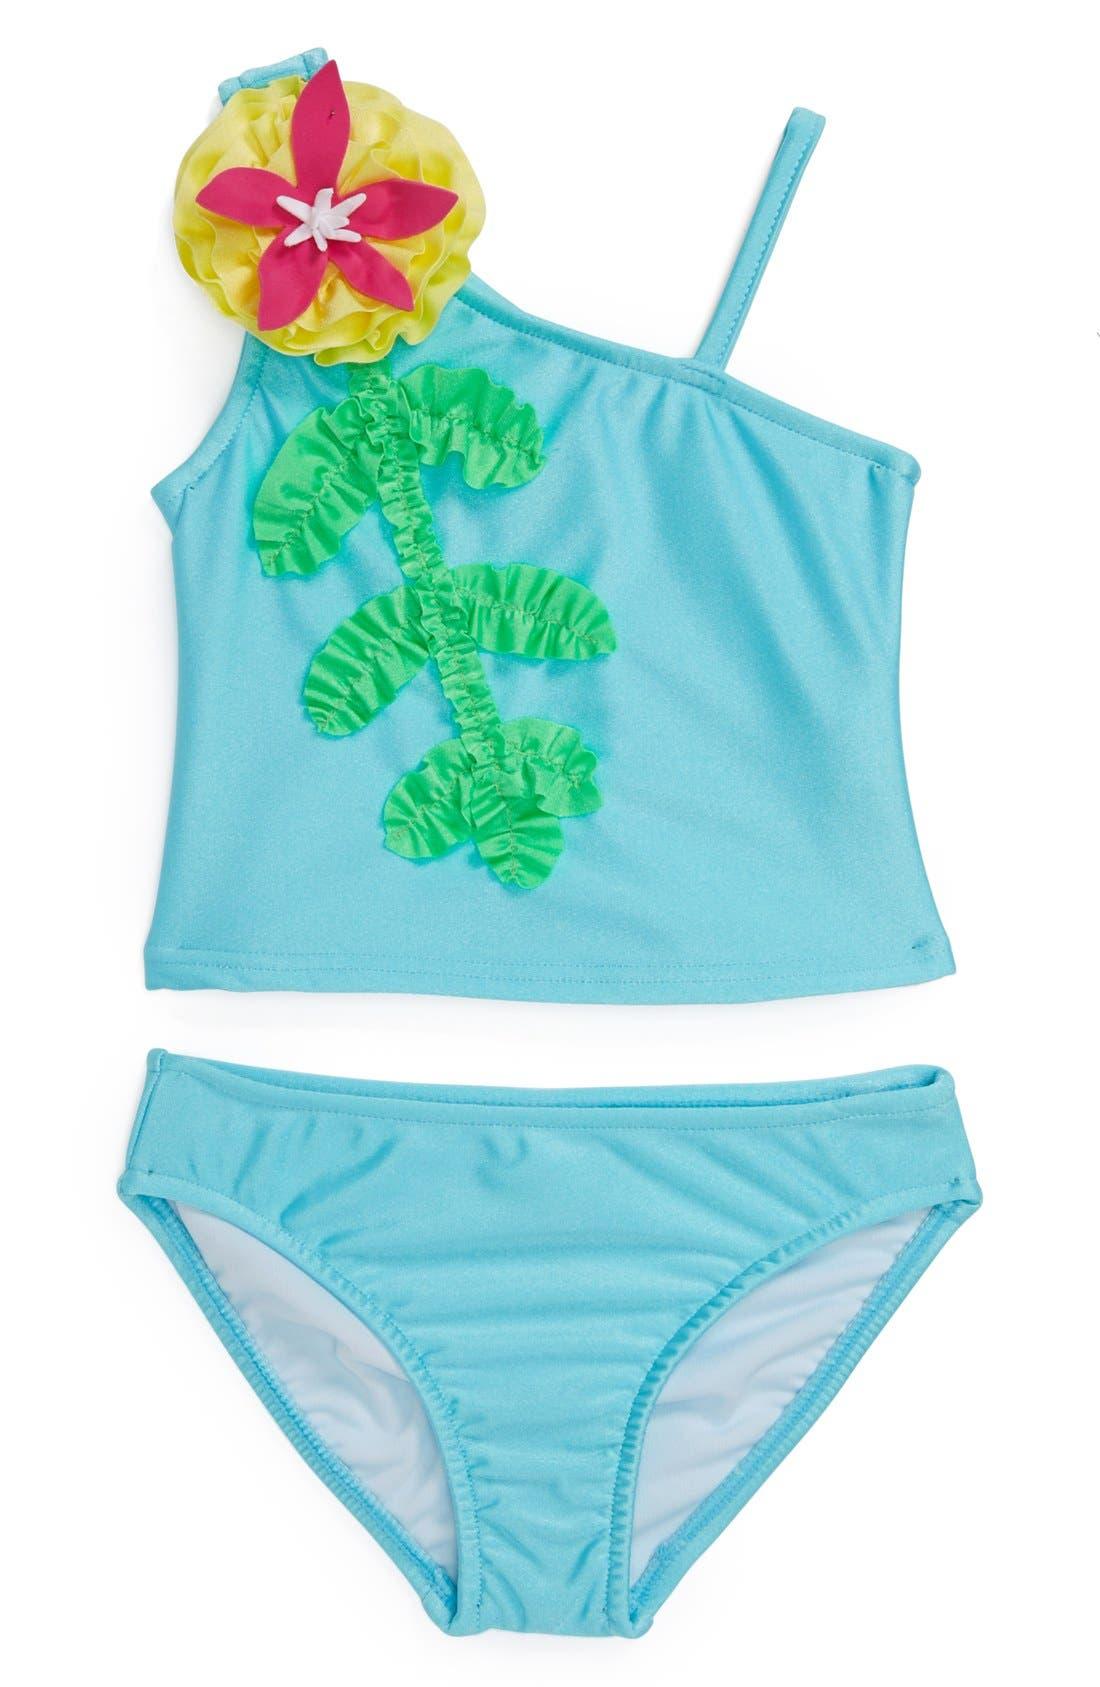 Main Image - Love U Lots 'Caribbean' Two-Piece Swimsuit (Baby Girls)